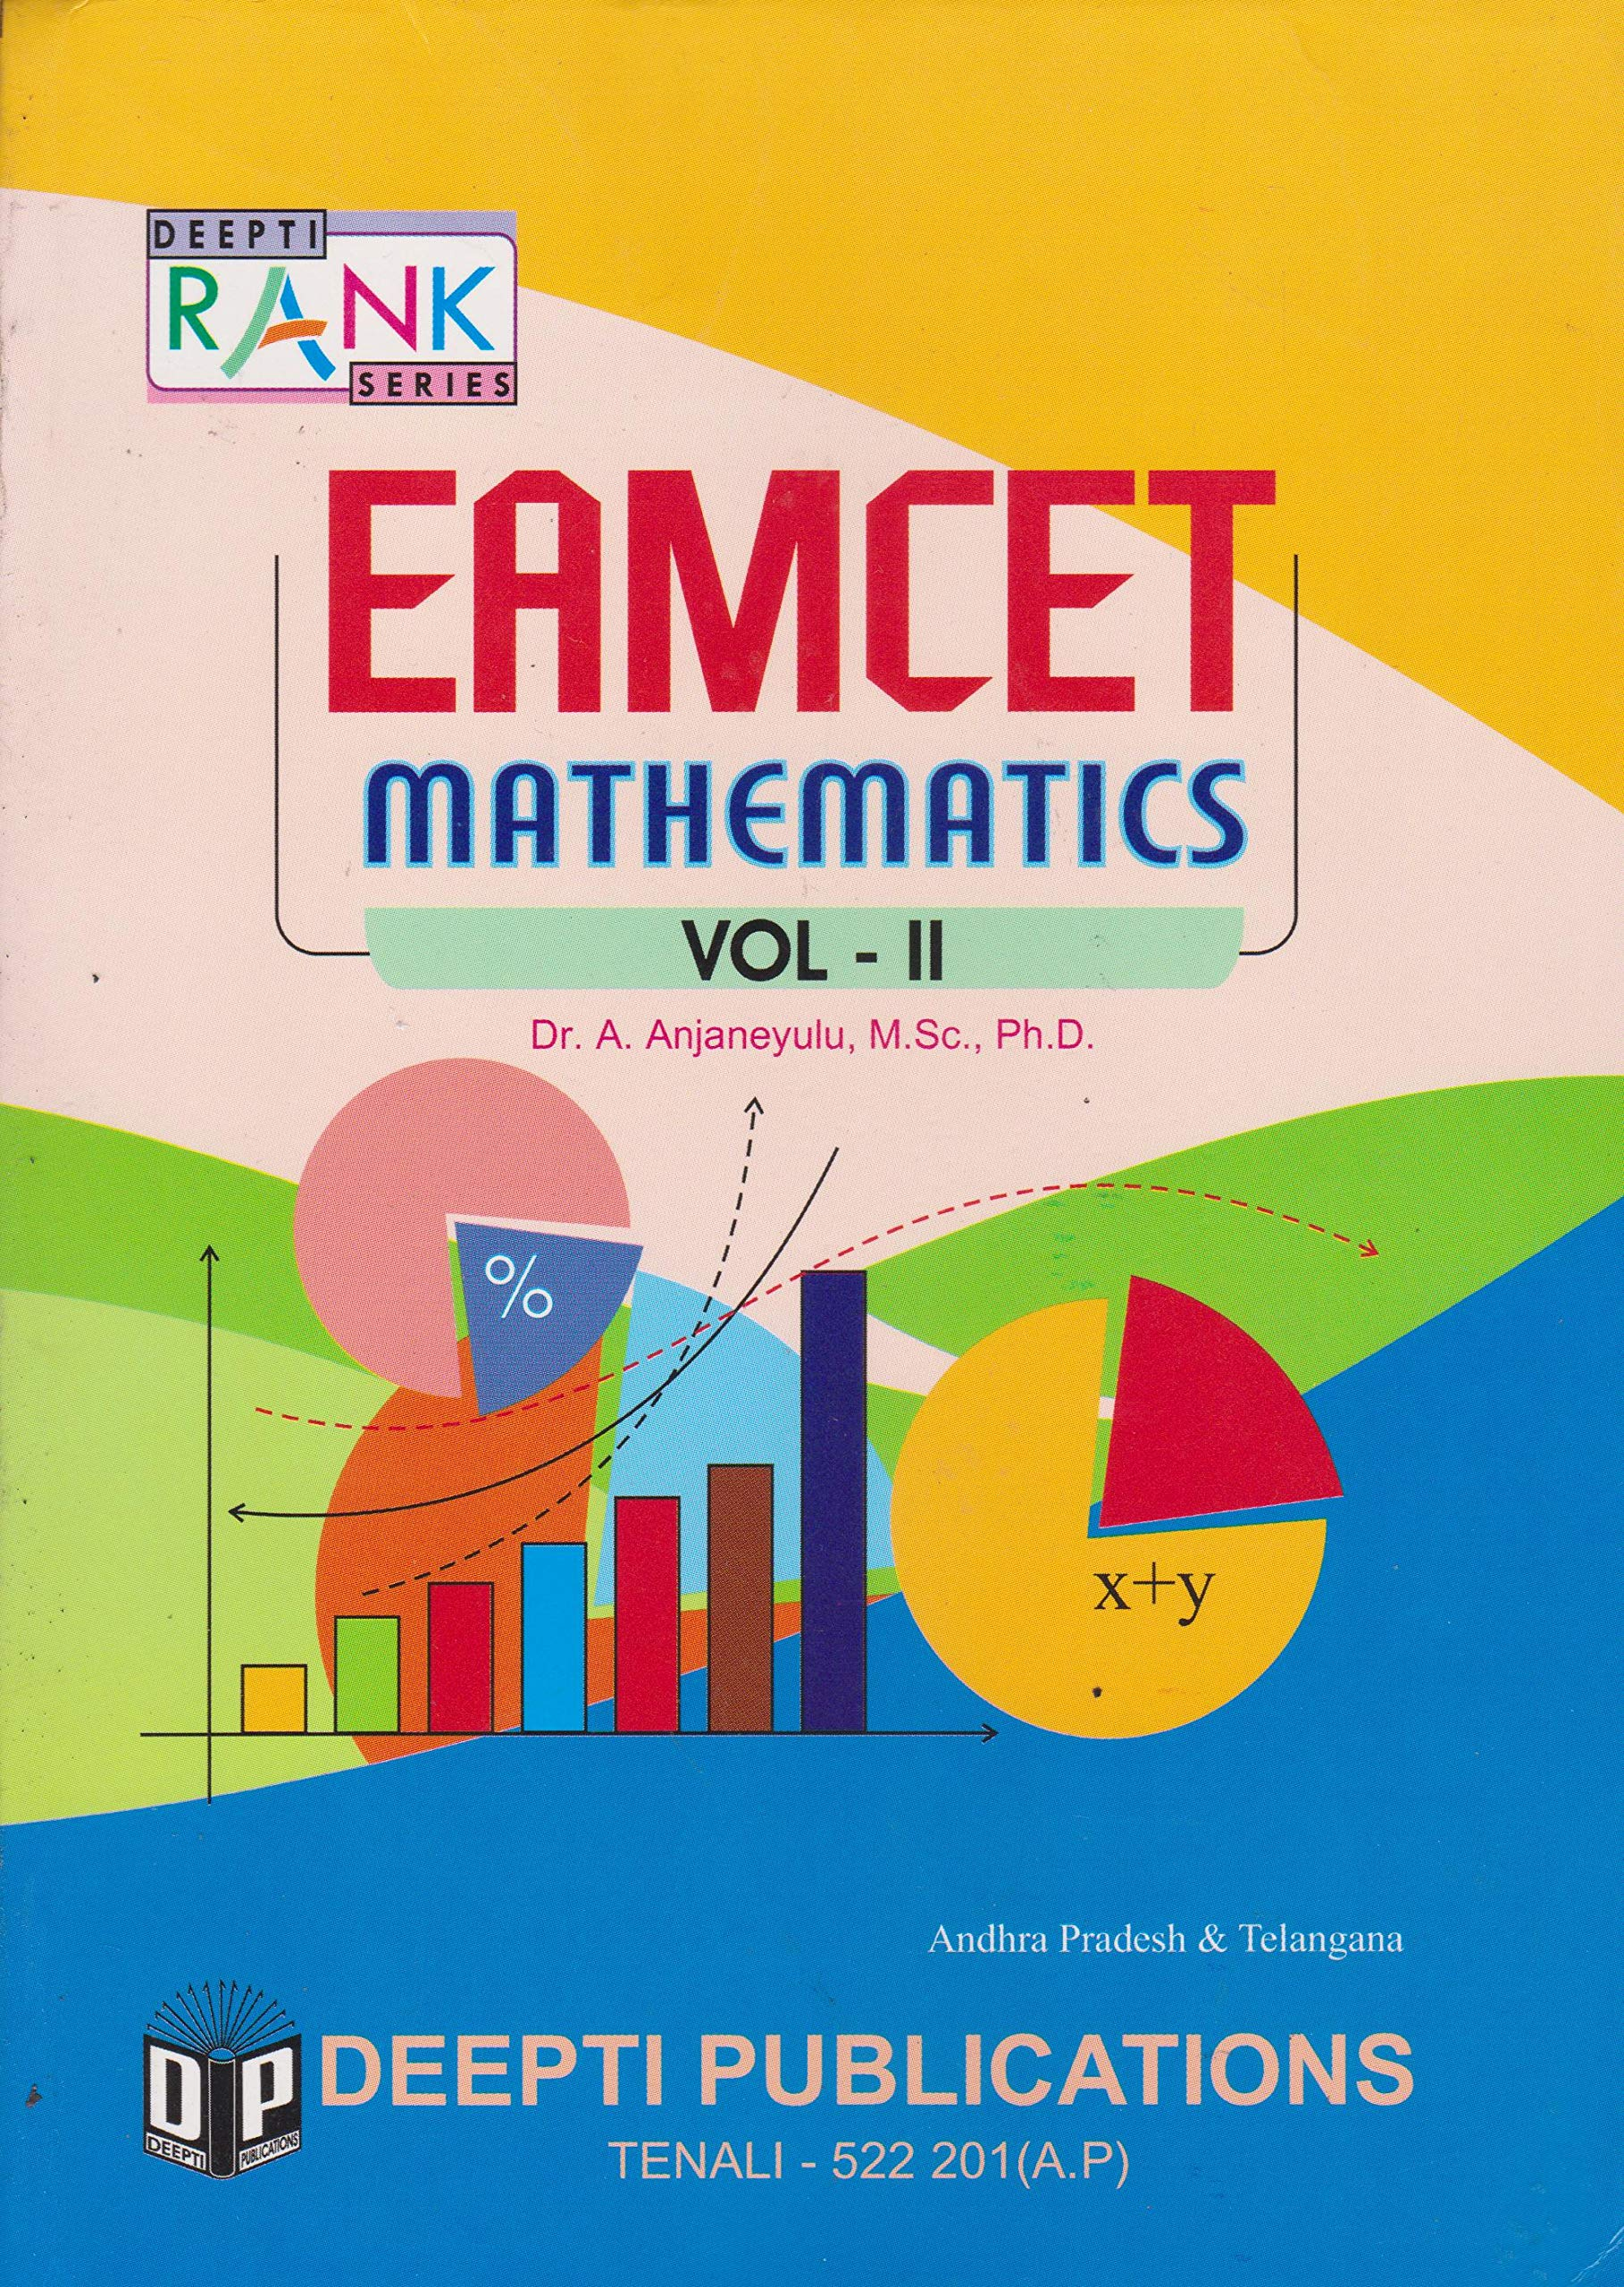 Eamcet Books Pdf